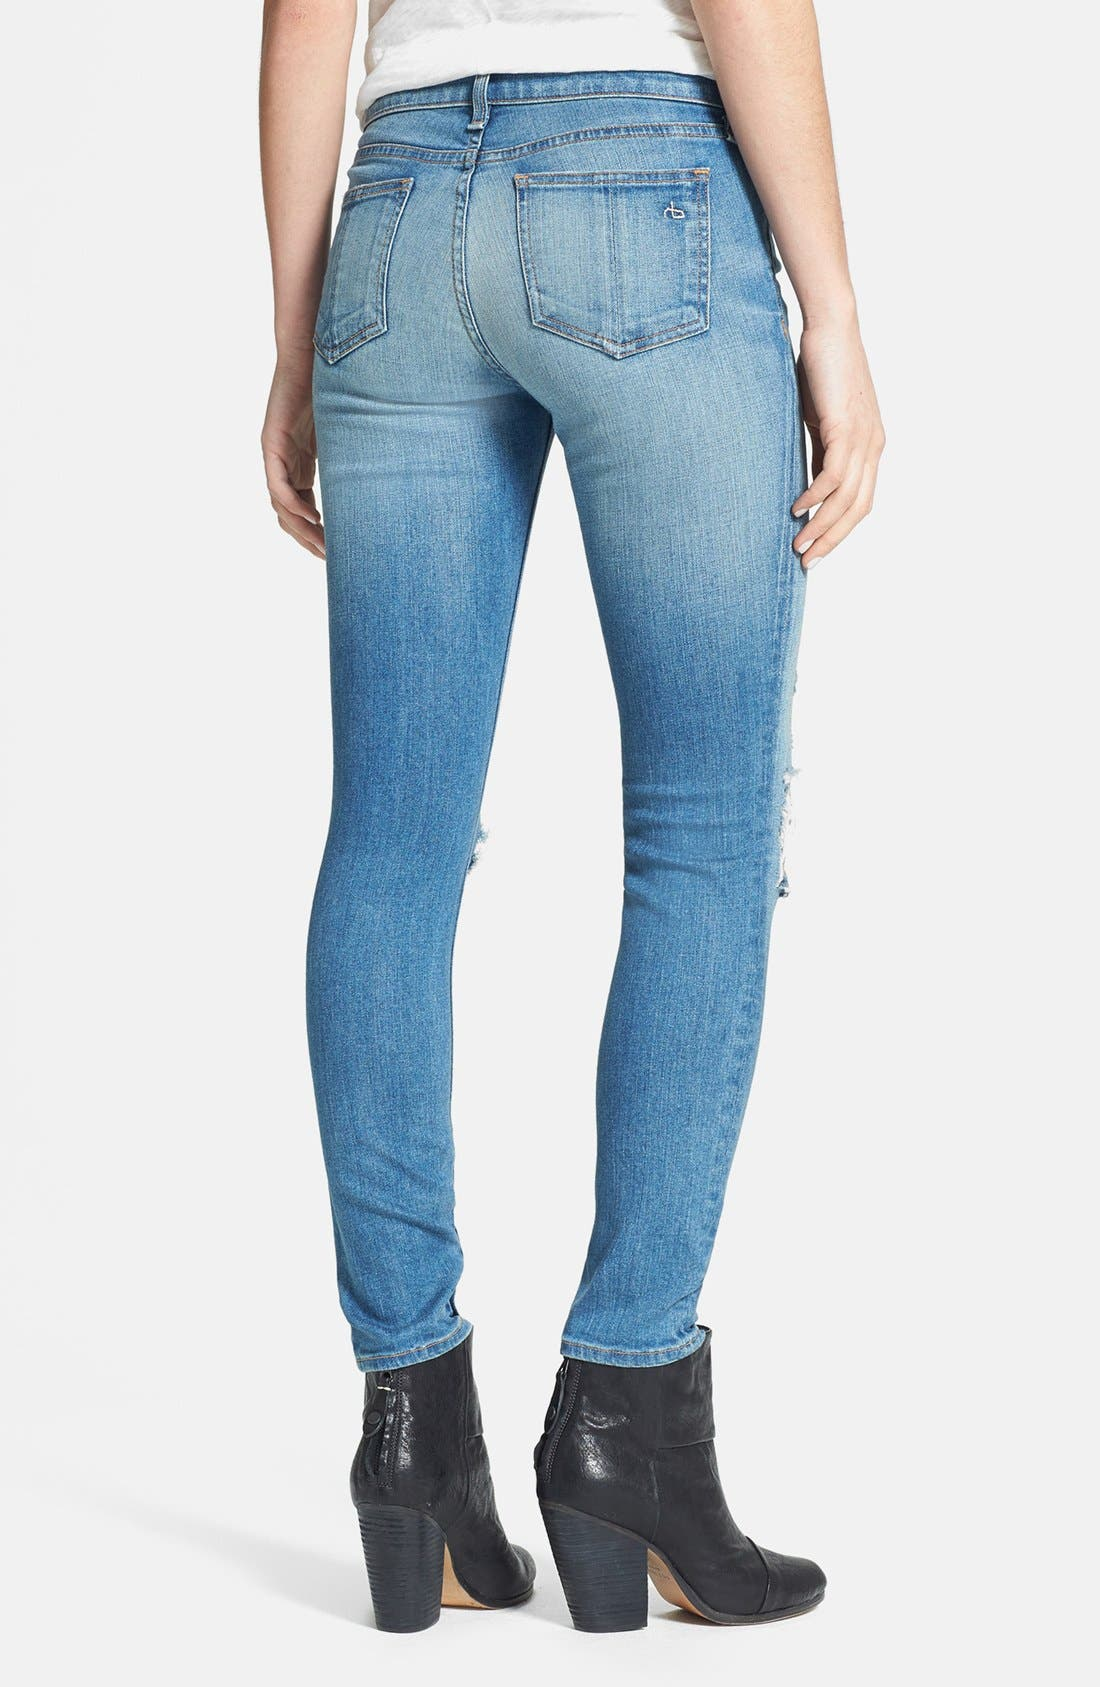 Alternate Image 2  - rag & bone/JEAN Destroyed Skinny Ankle Jeans (Shredded)